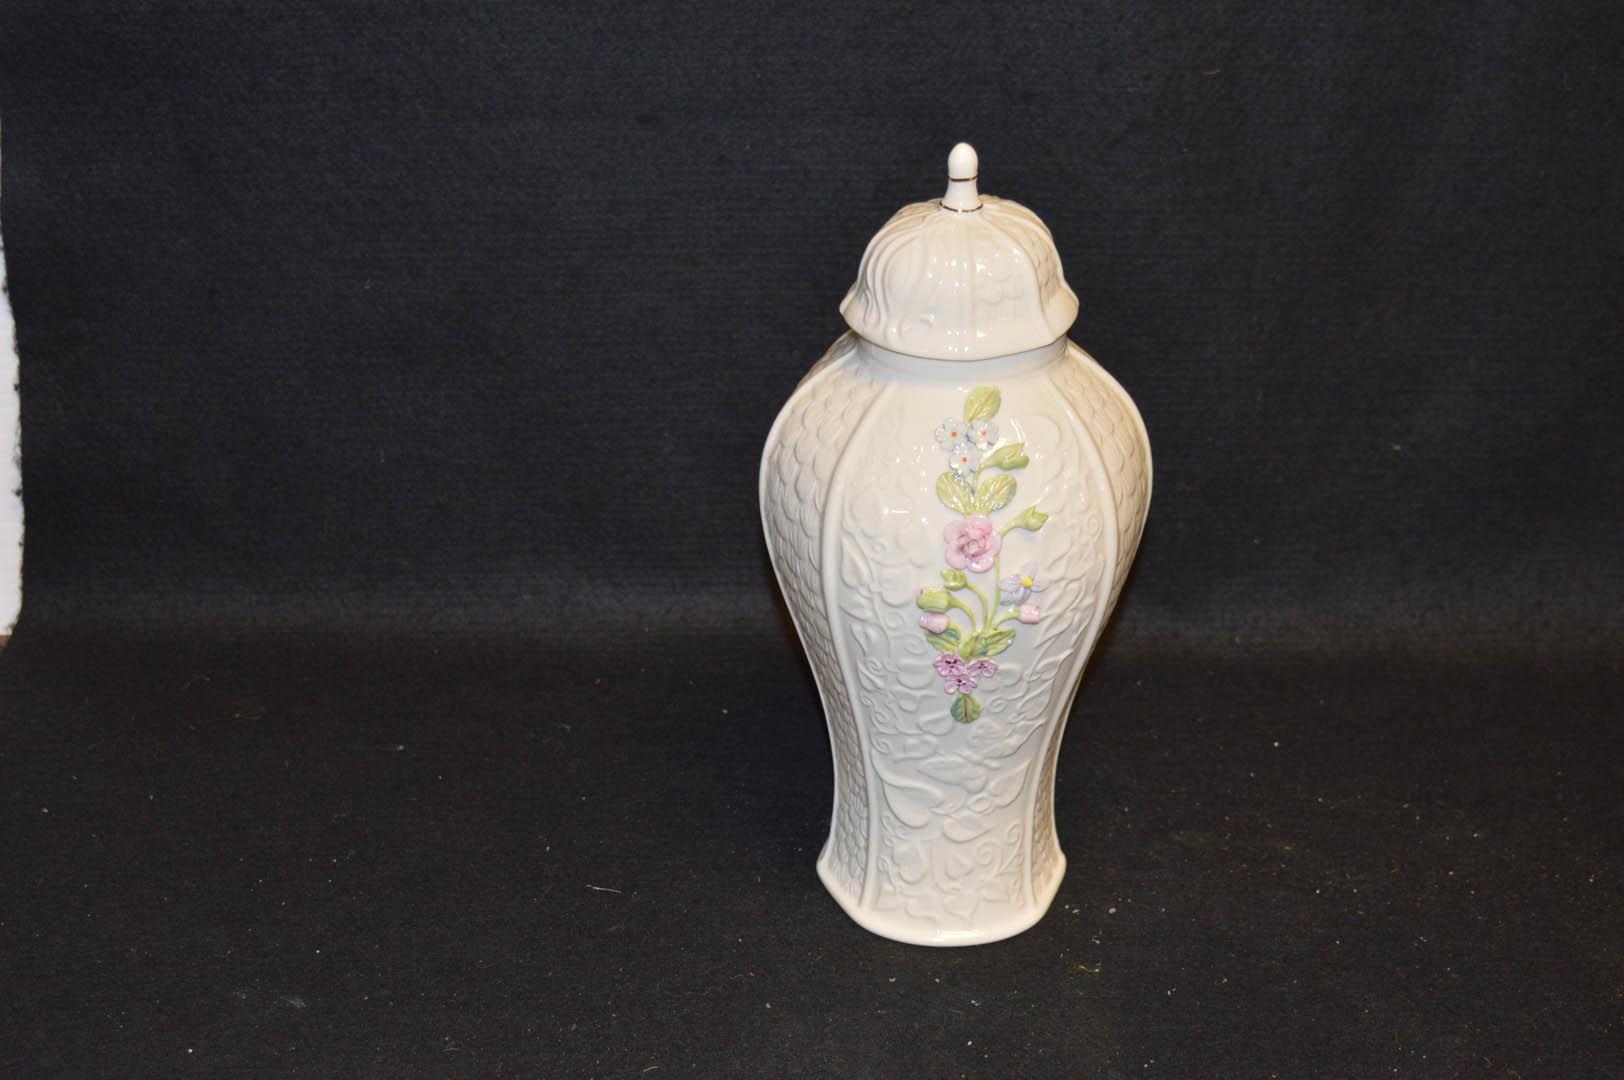 Lot 29 - A Belleek Limited Edition Millenium Vase